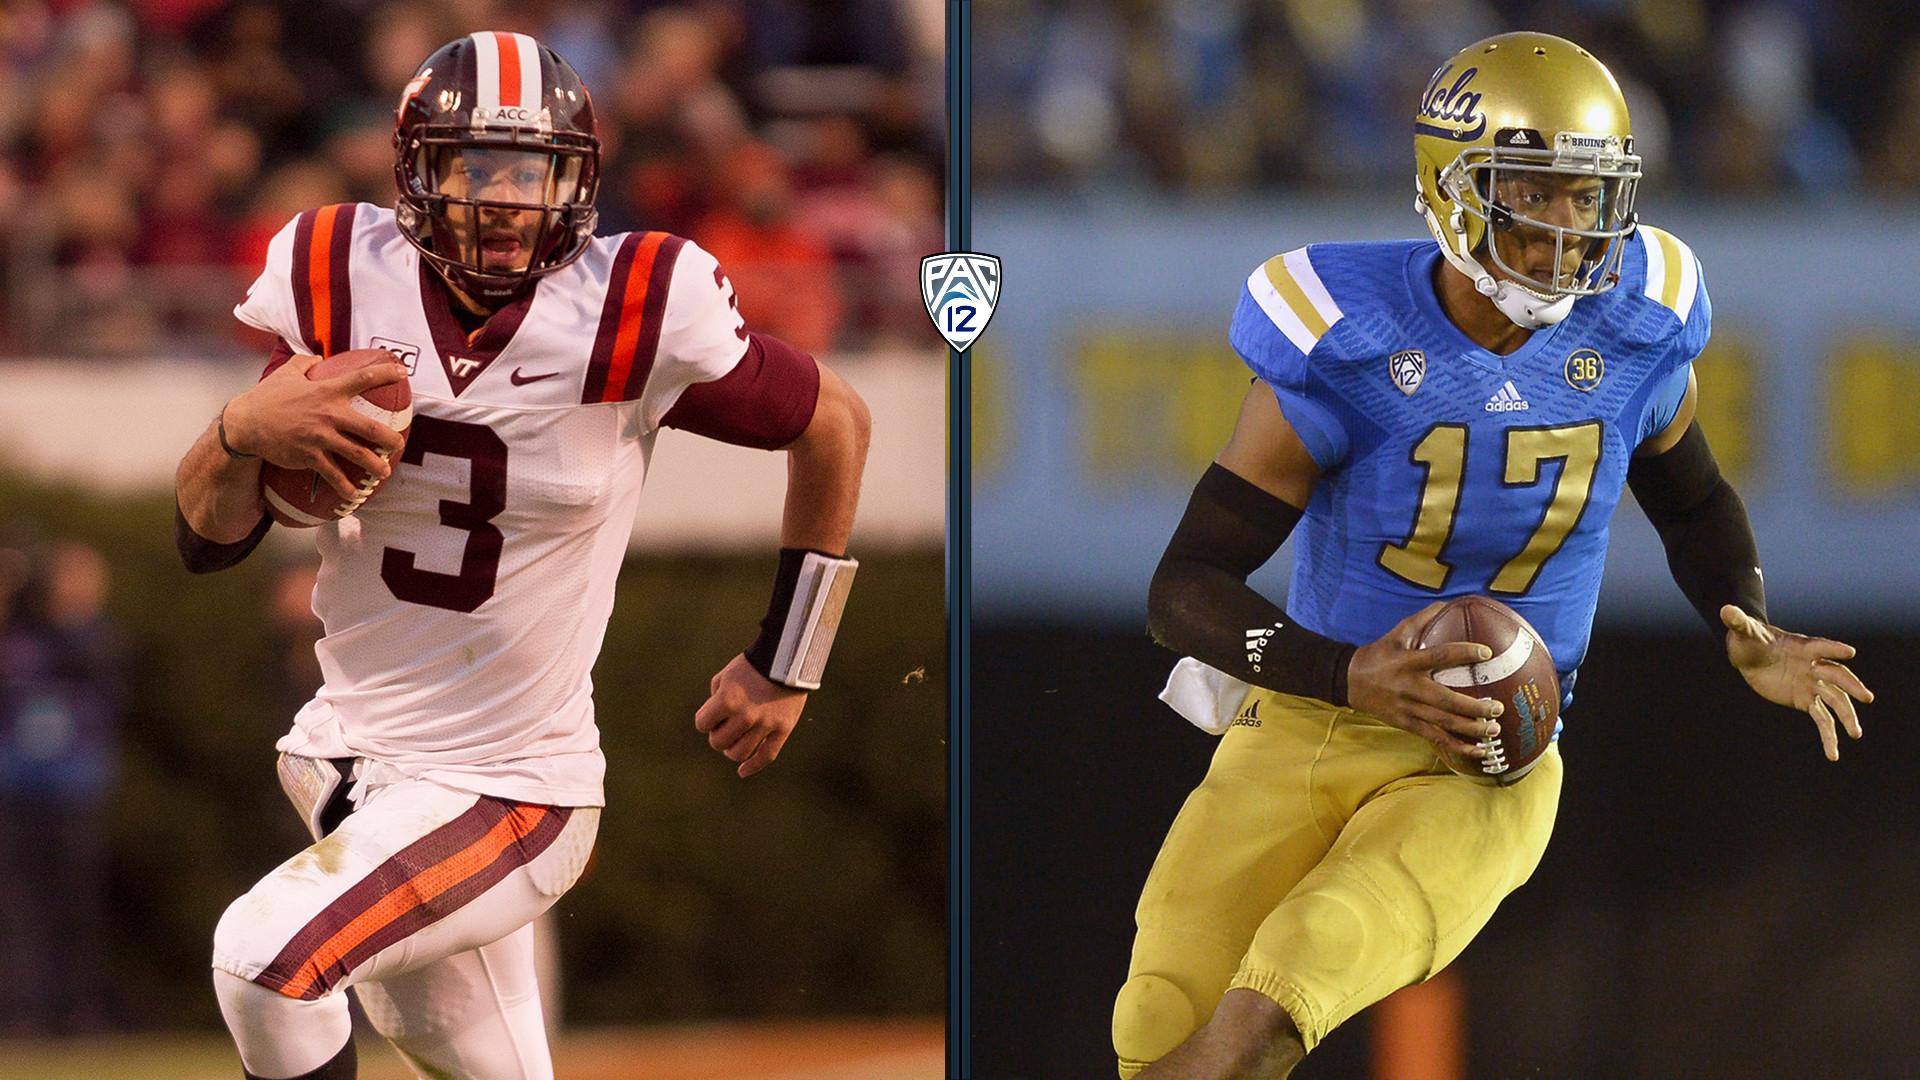 Sun Bowl preview: UCLA's high-powered offense battles Virginia Tech's elite  defense | Pac-12